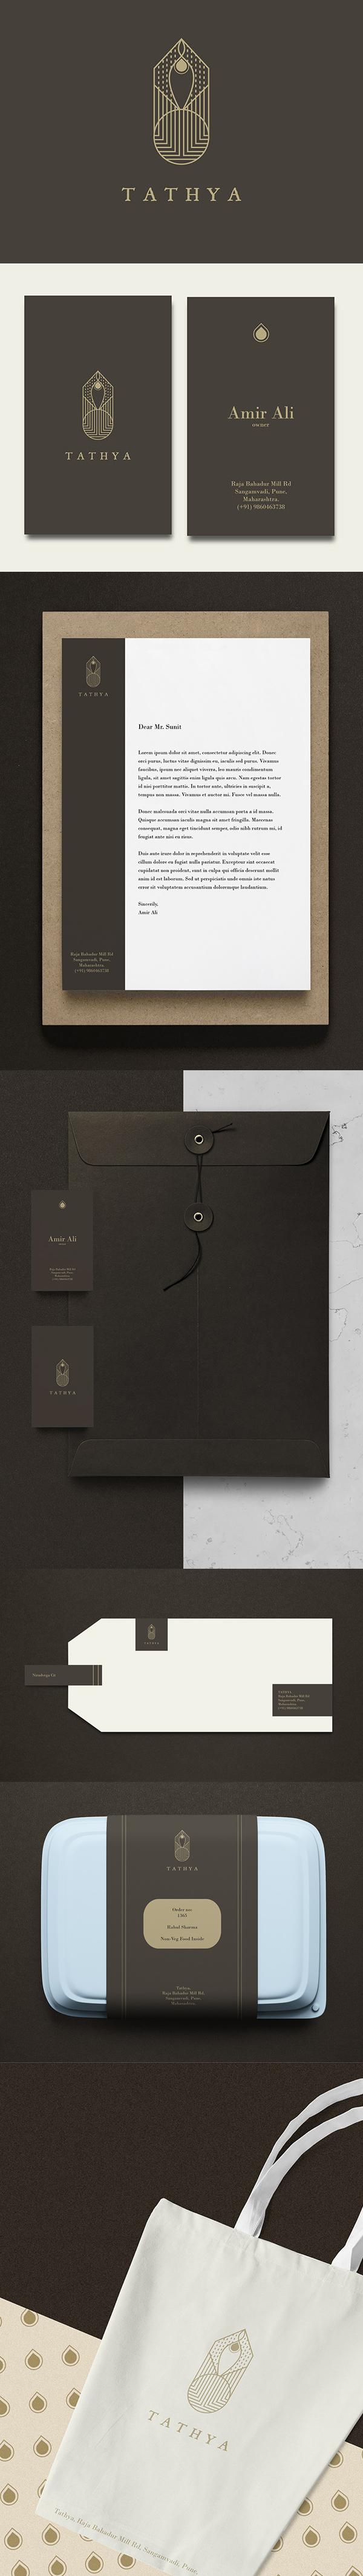 Branding: TATHYA Branding & Identity Design by Karan Gujar